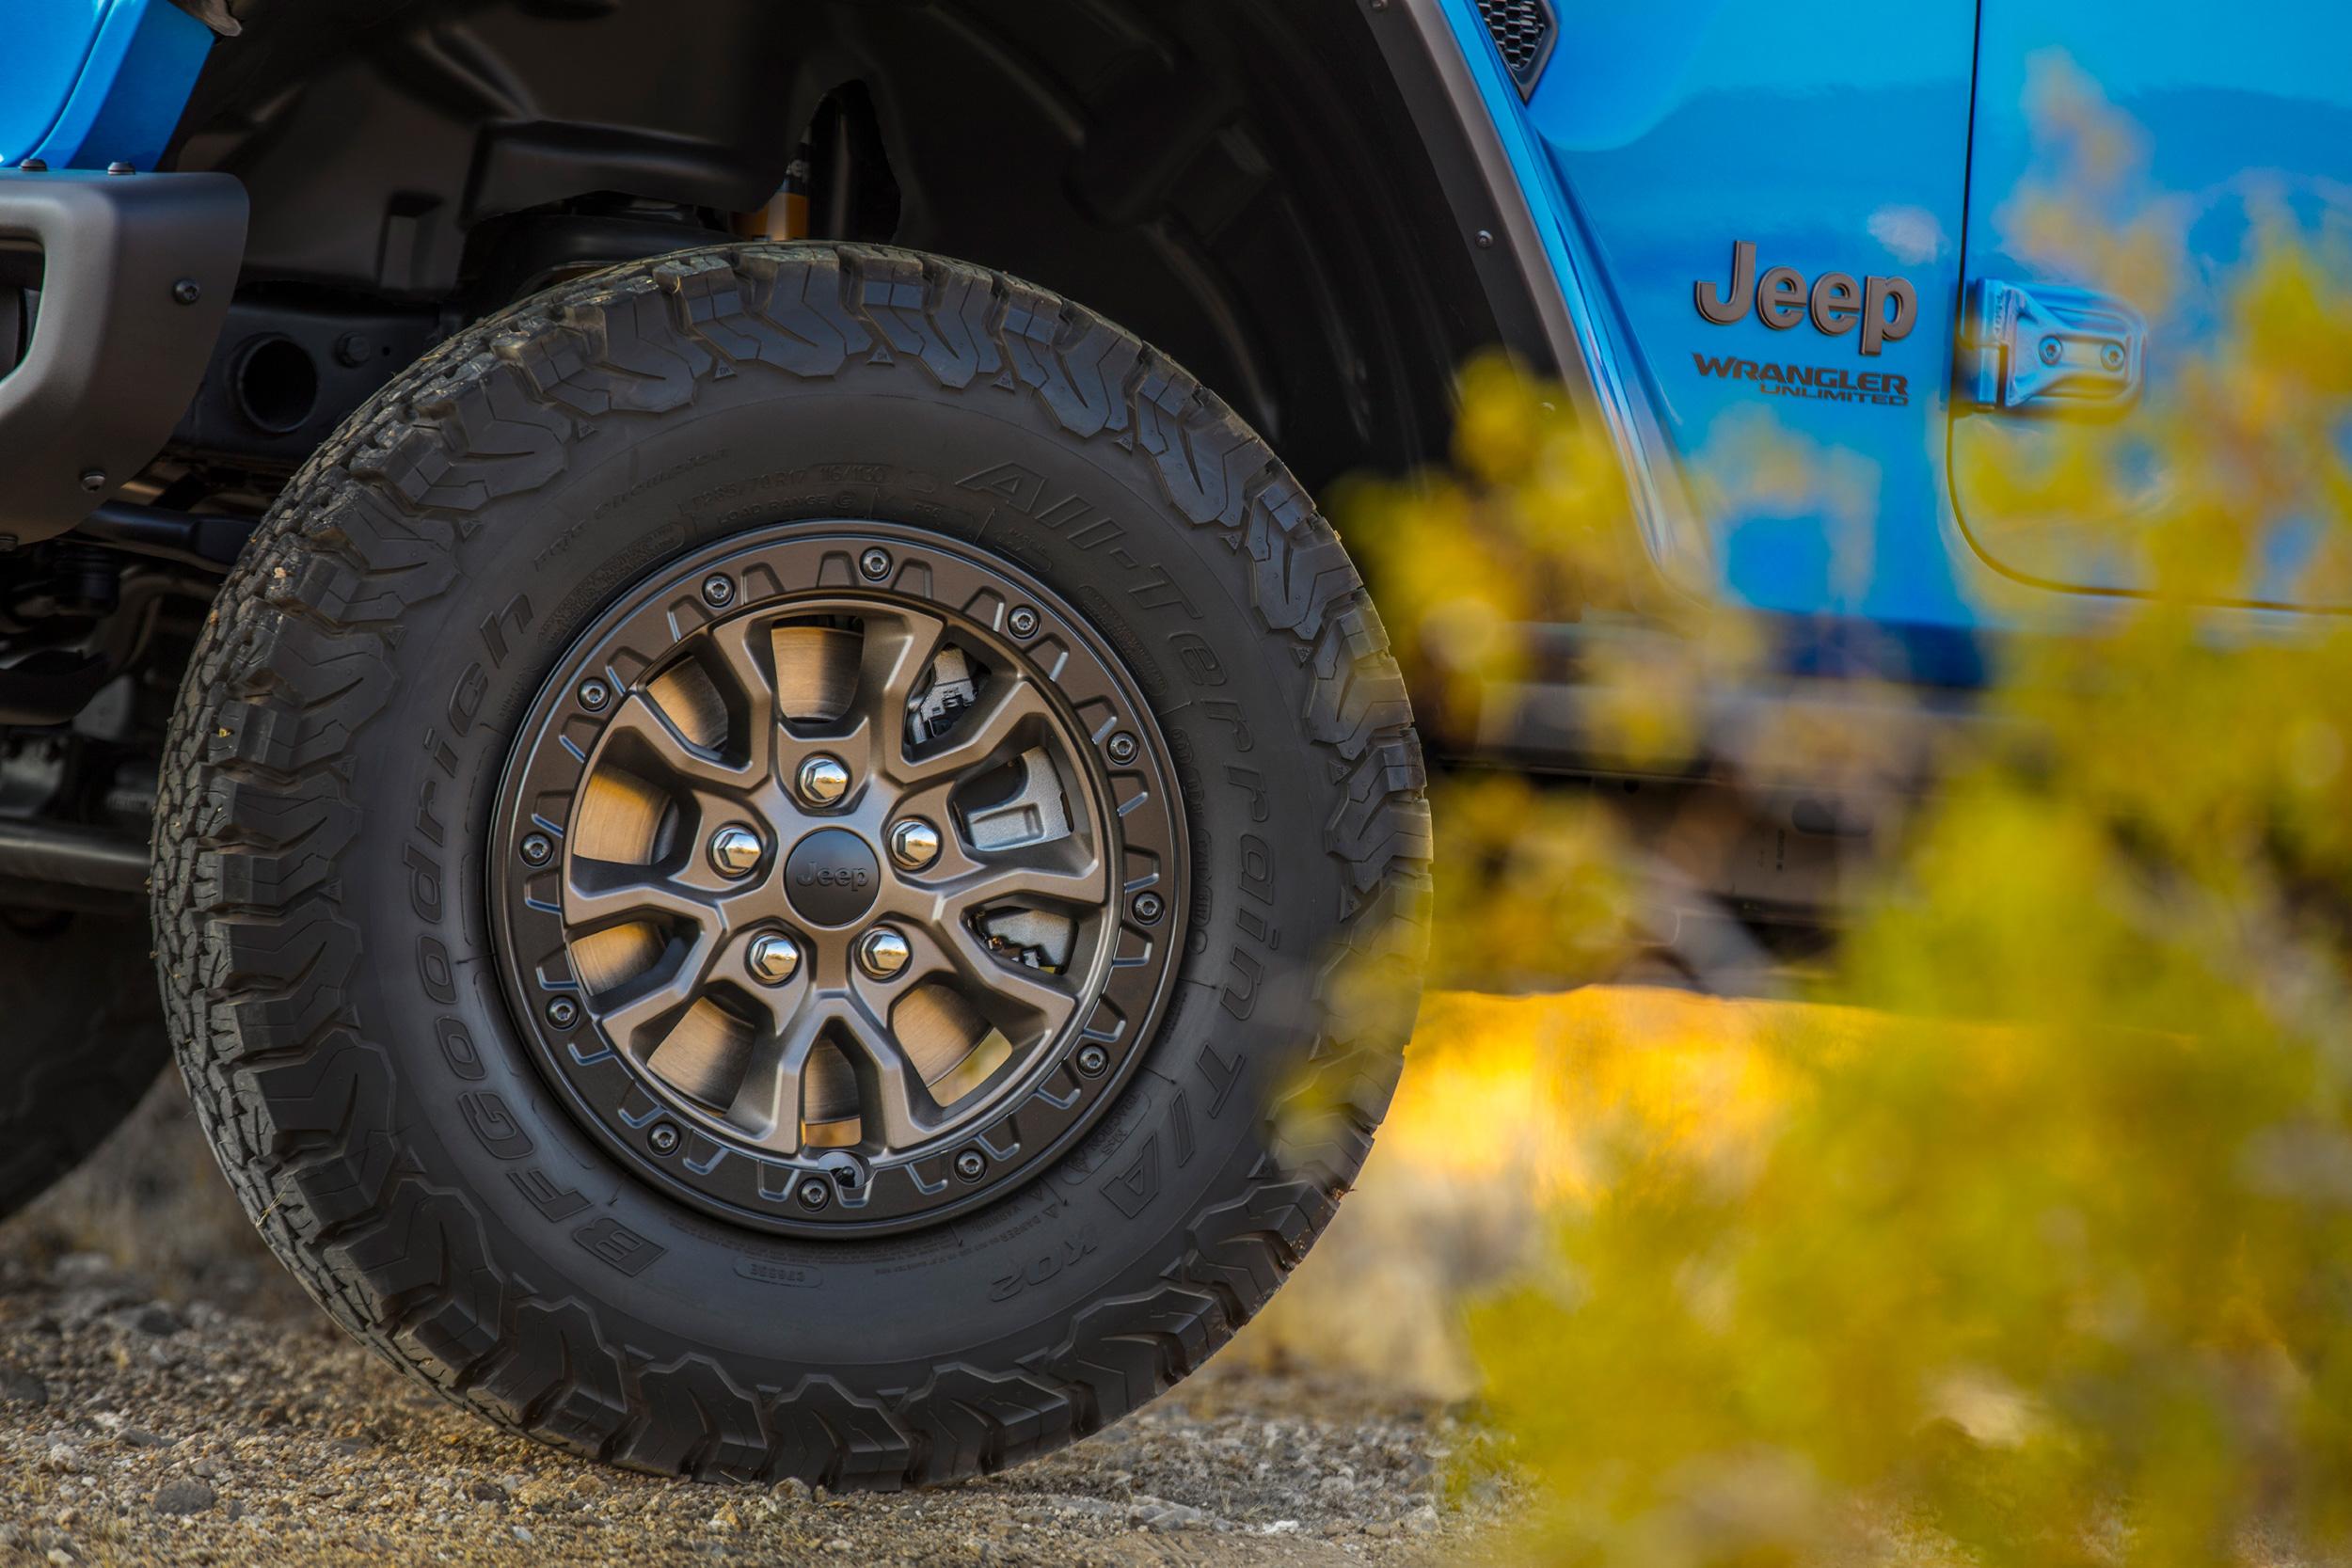 2021 Jeep Wrangler Rubicon 392 wheels